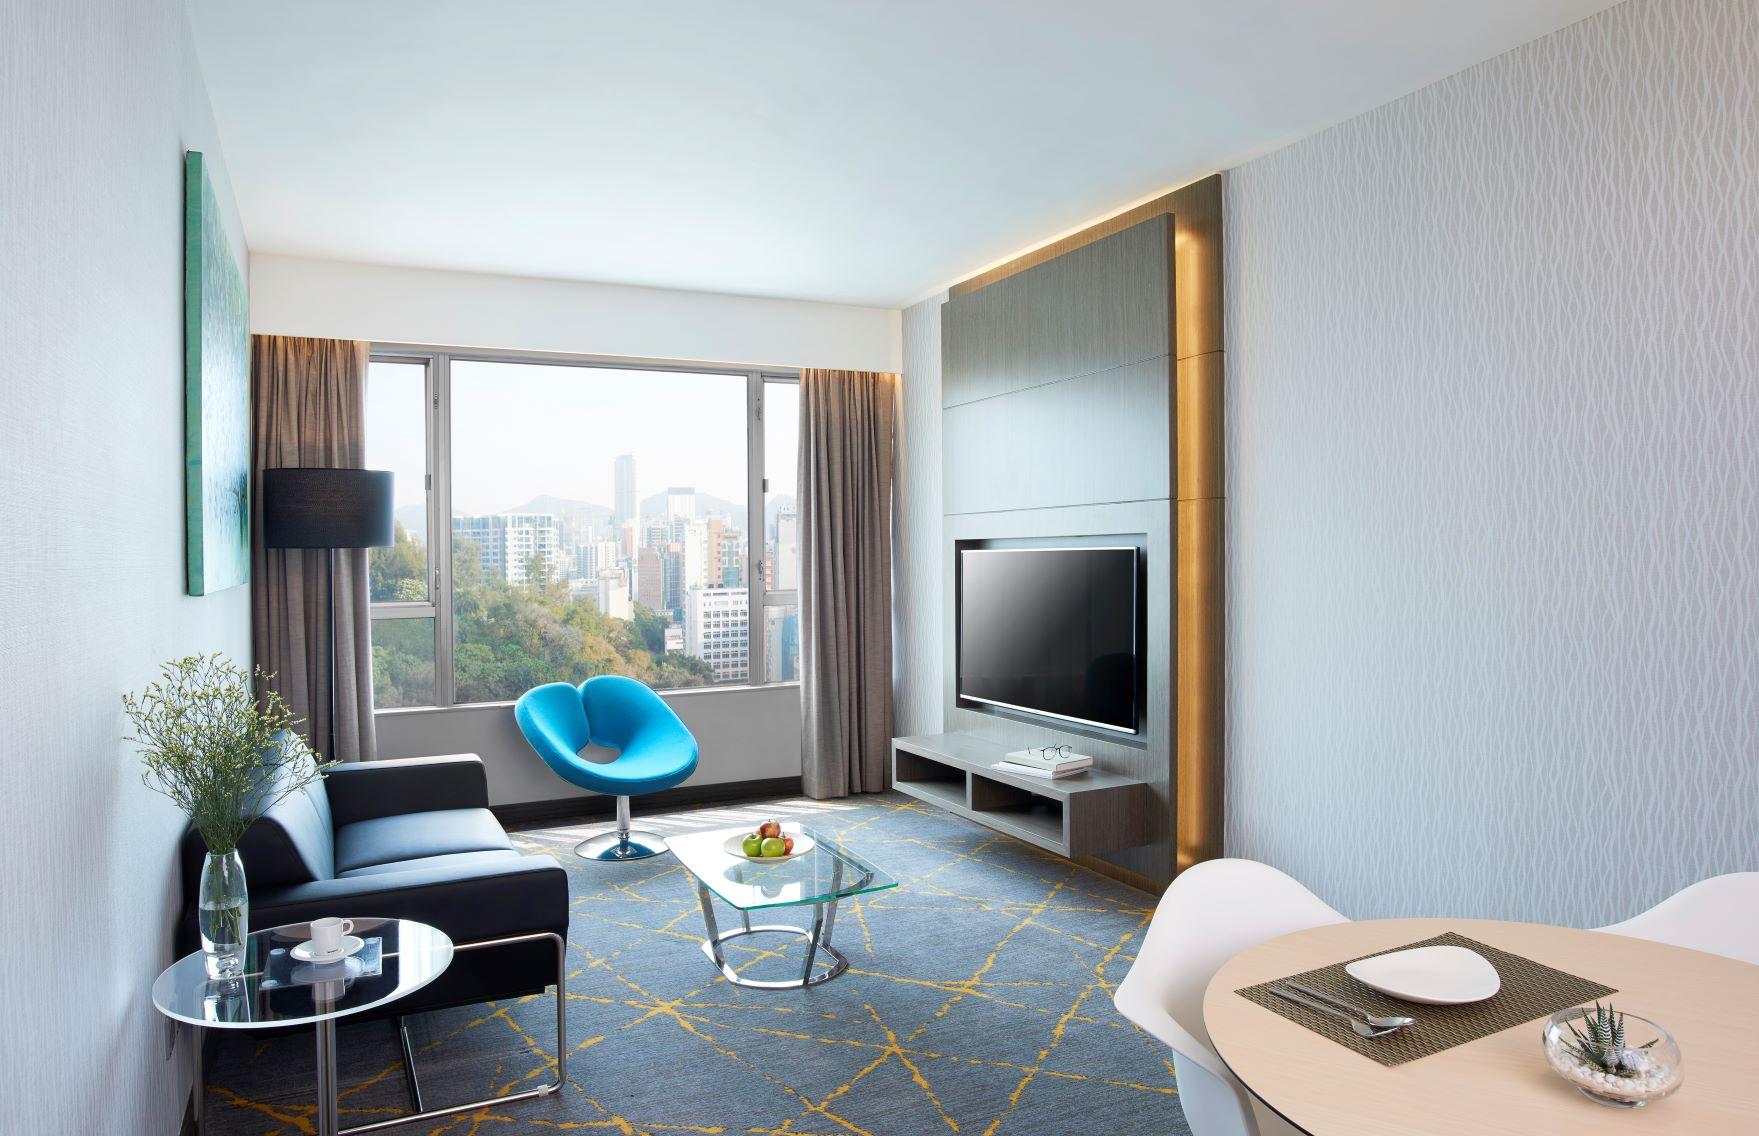 Work-from-hotel:城景國際商務及住宿套餐 尊貴套房